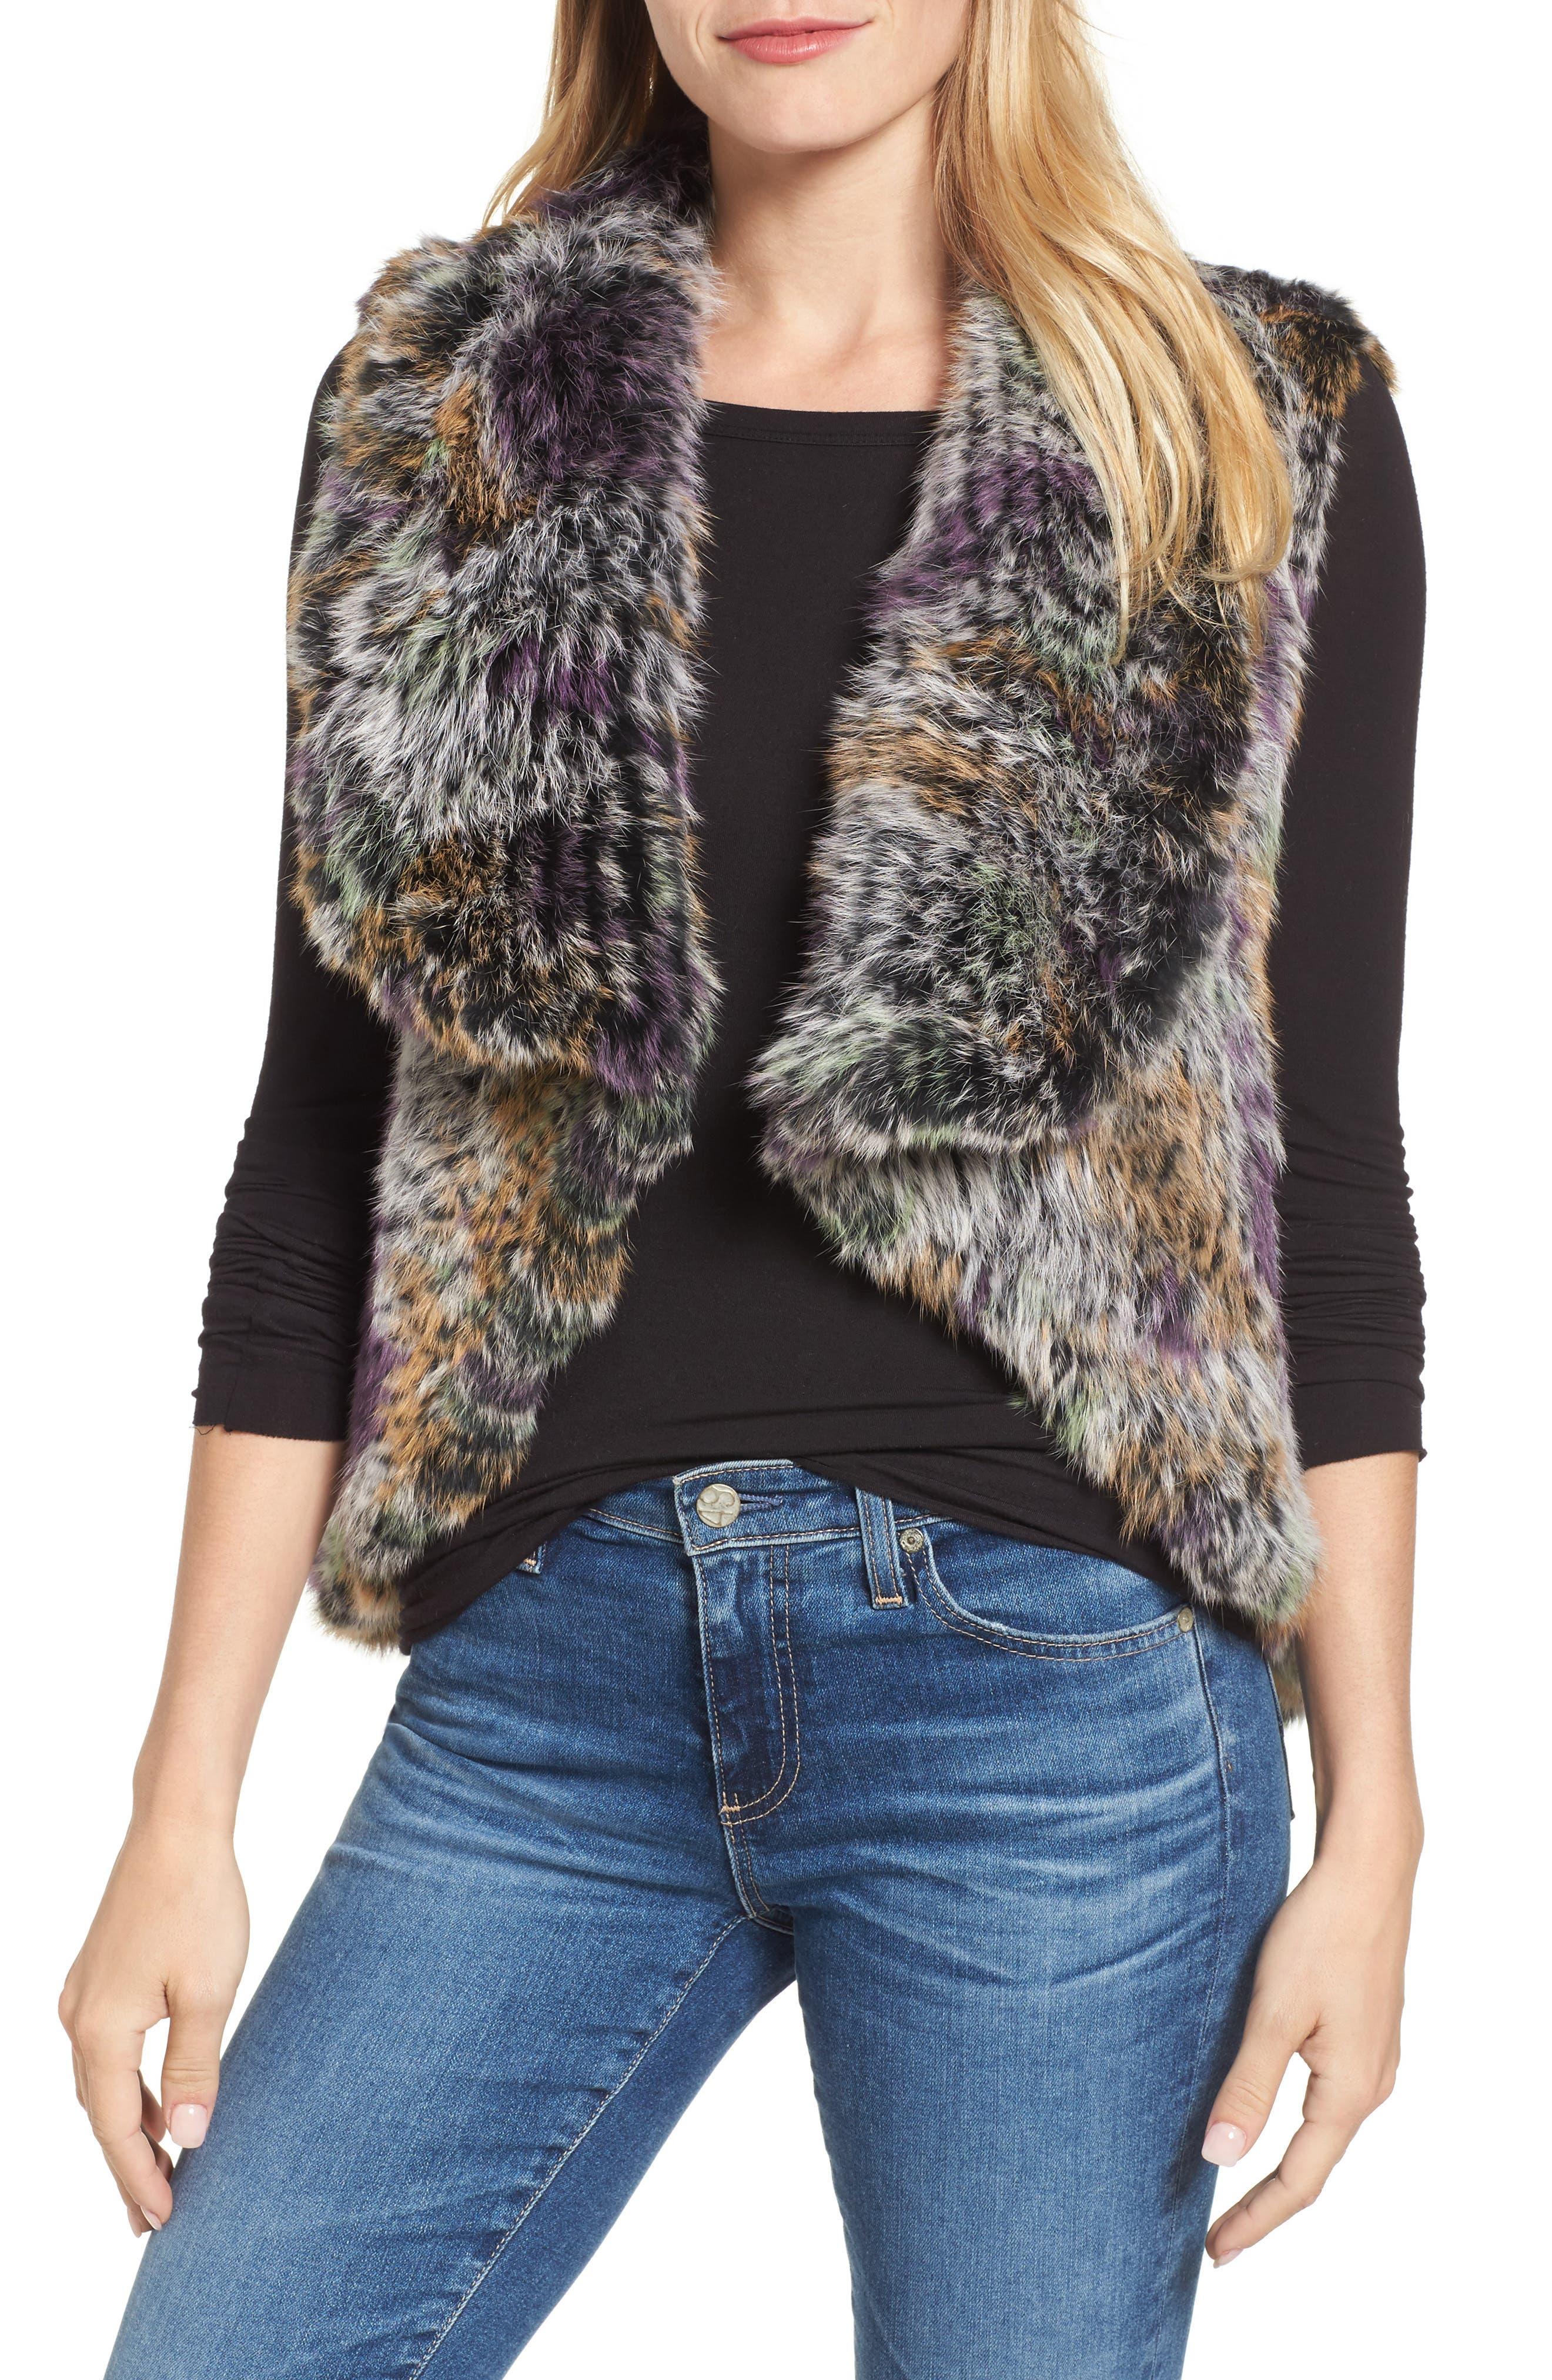 Woven Genuine Rabbit Fur Vest,                         Main,                         color, Multi